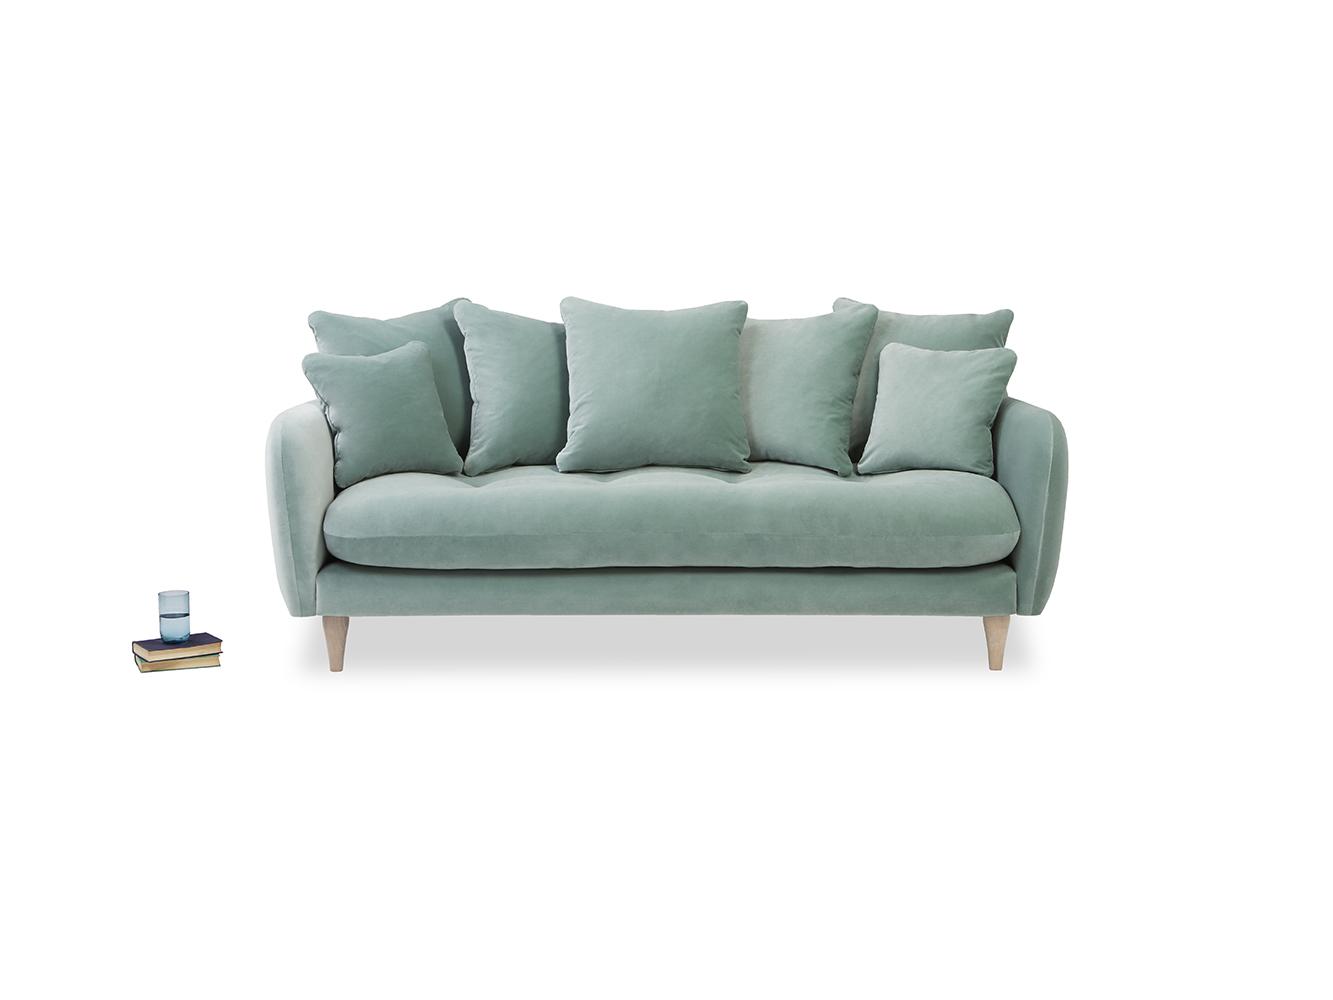 Superb Small Skinny Minny Sofa In Thatch House Fabric Spiritservingveterans Wood Chair Design Ideas Spiritservingveteransorg